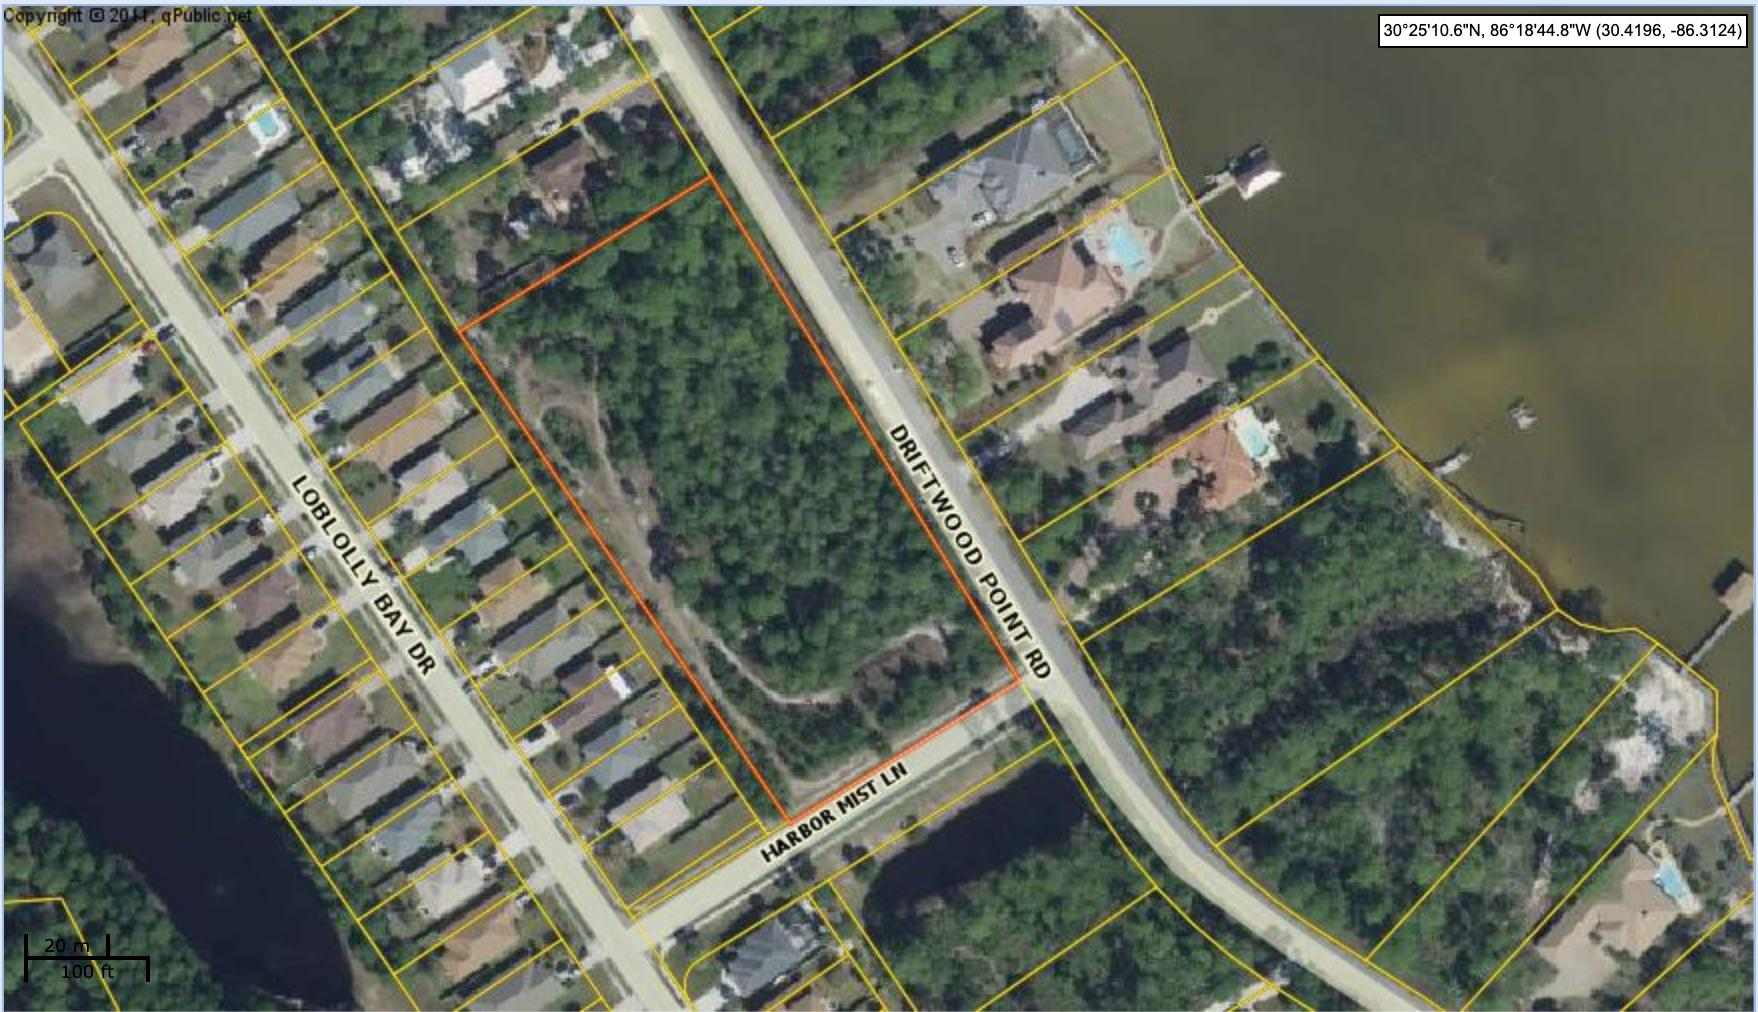 Lot 29-H County Parcel Map